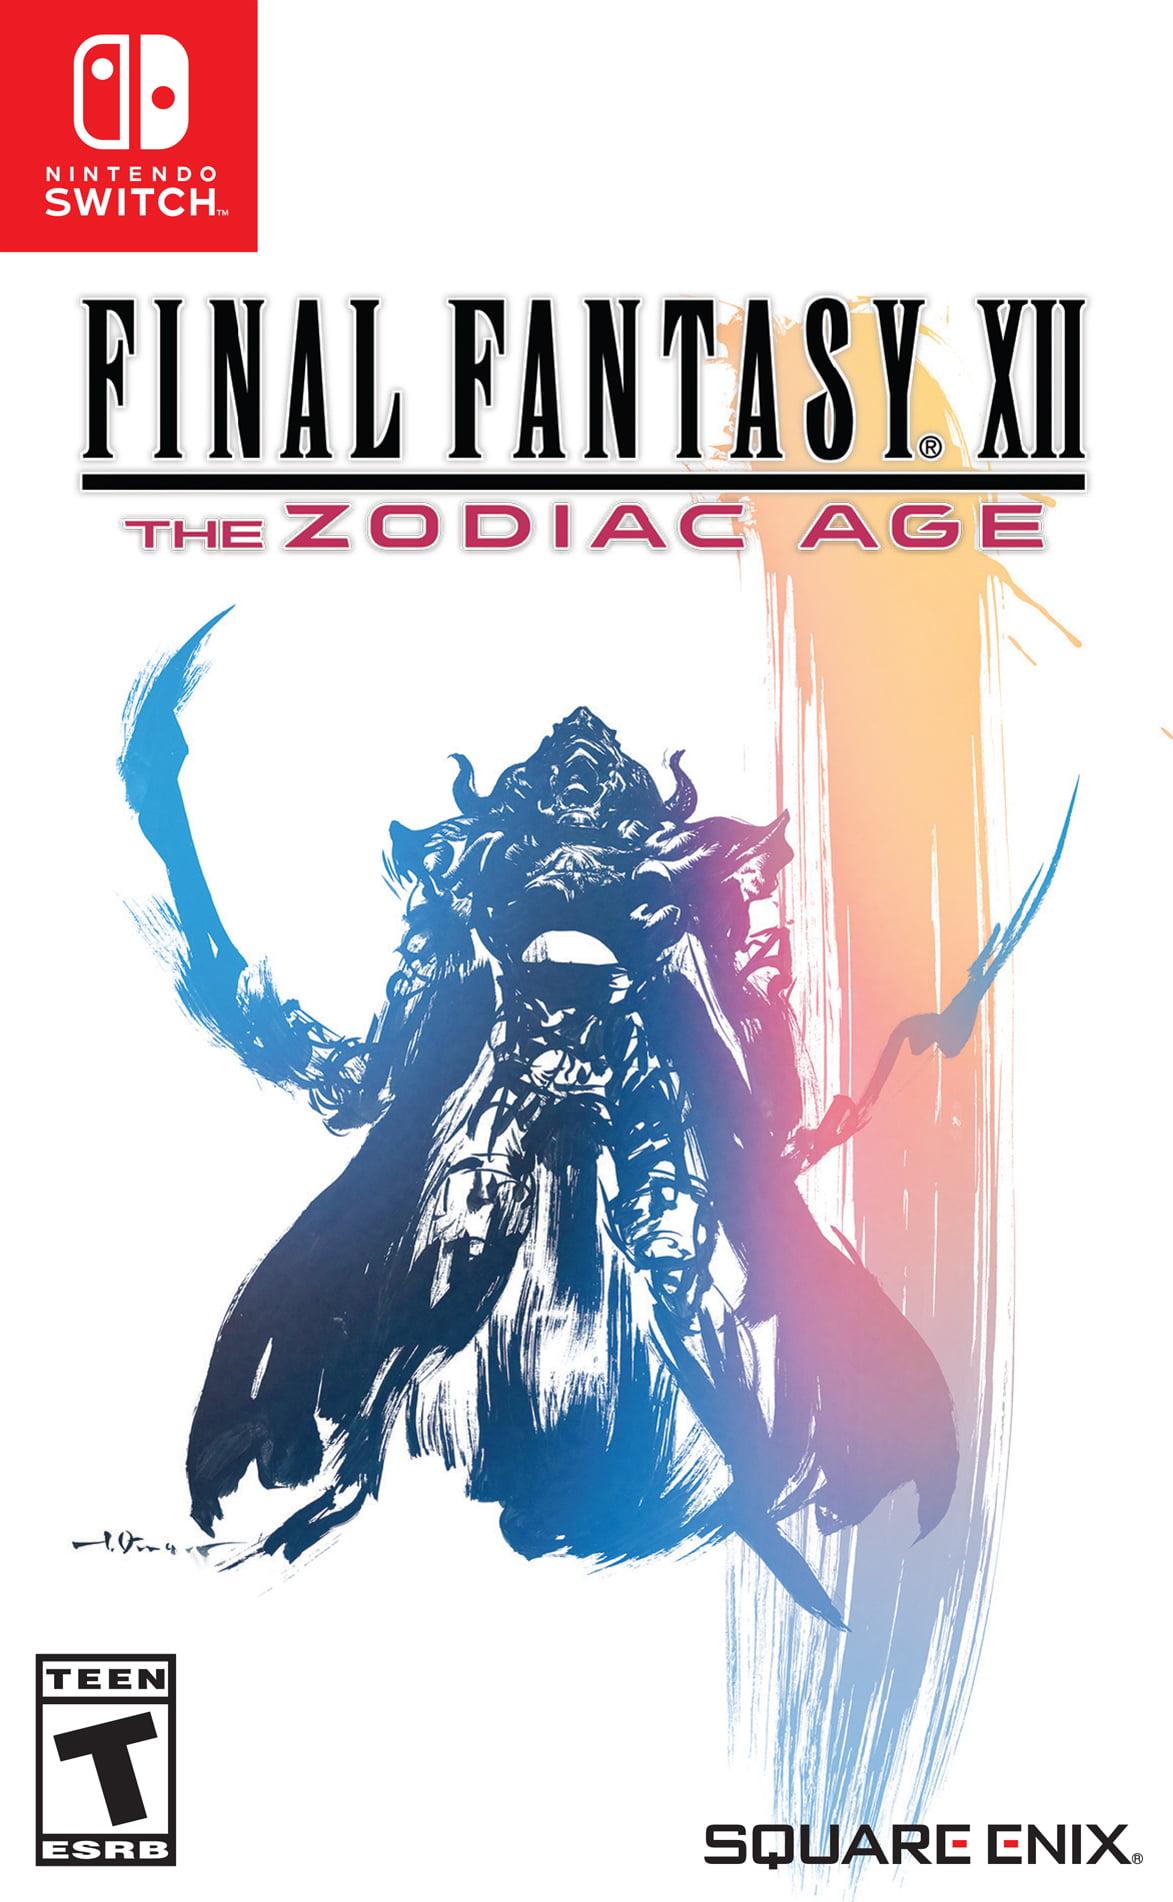 Final Fantasy Xii The Zodiac Age Square Enix Nintendo Switch